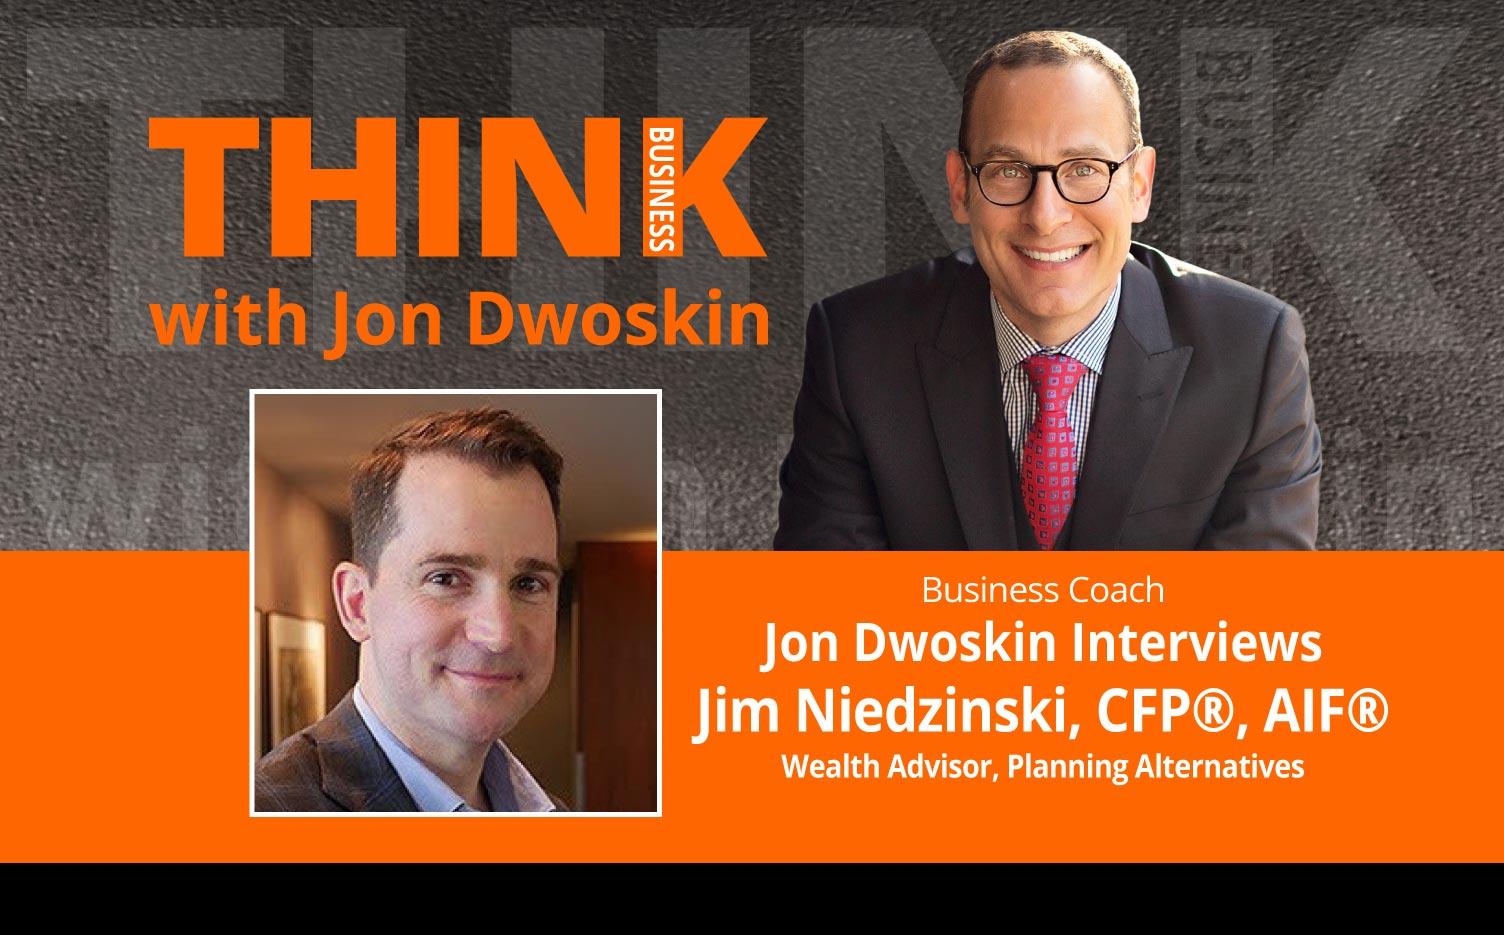 THINK Business Podcast: Jon Dwoskin Interviews Jim Niedzinski, CFP®, AIF®, Wealth Advisor, Planning Alternatives